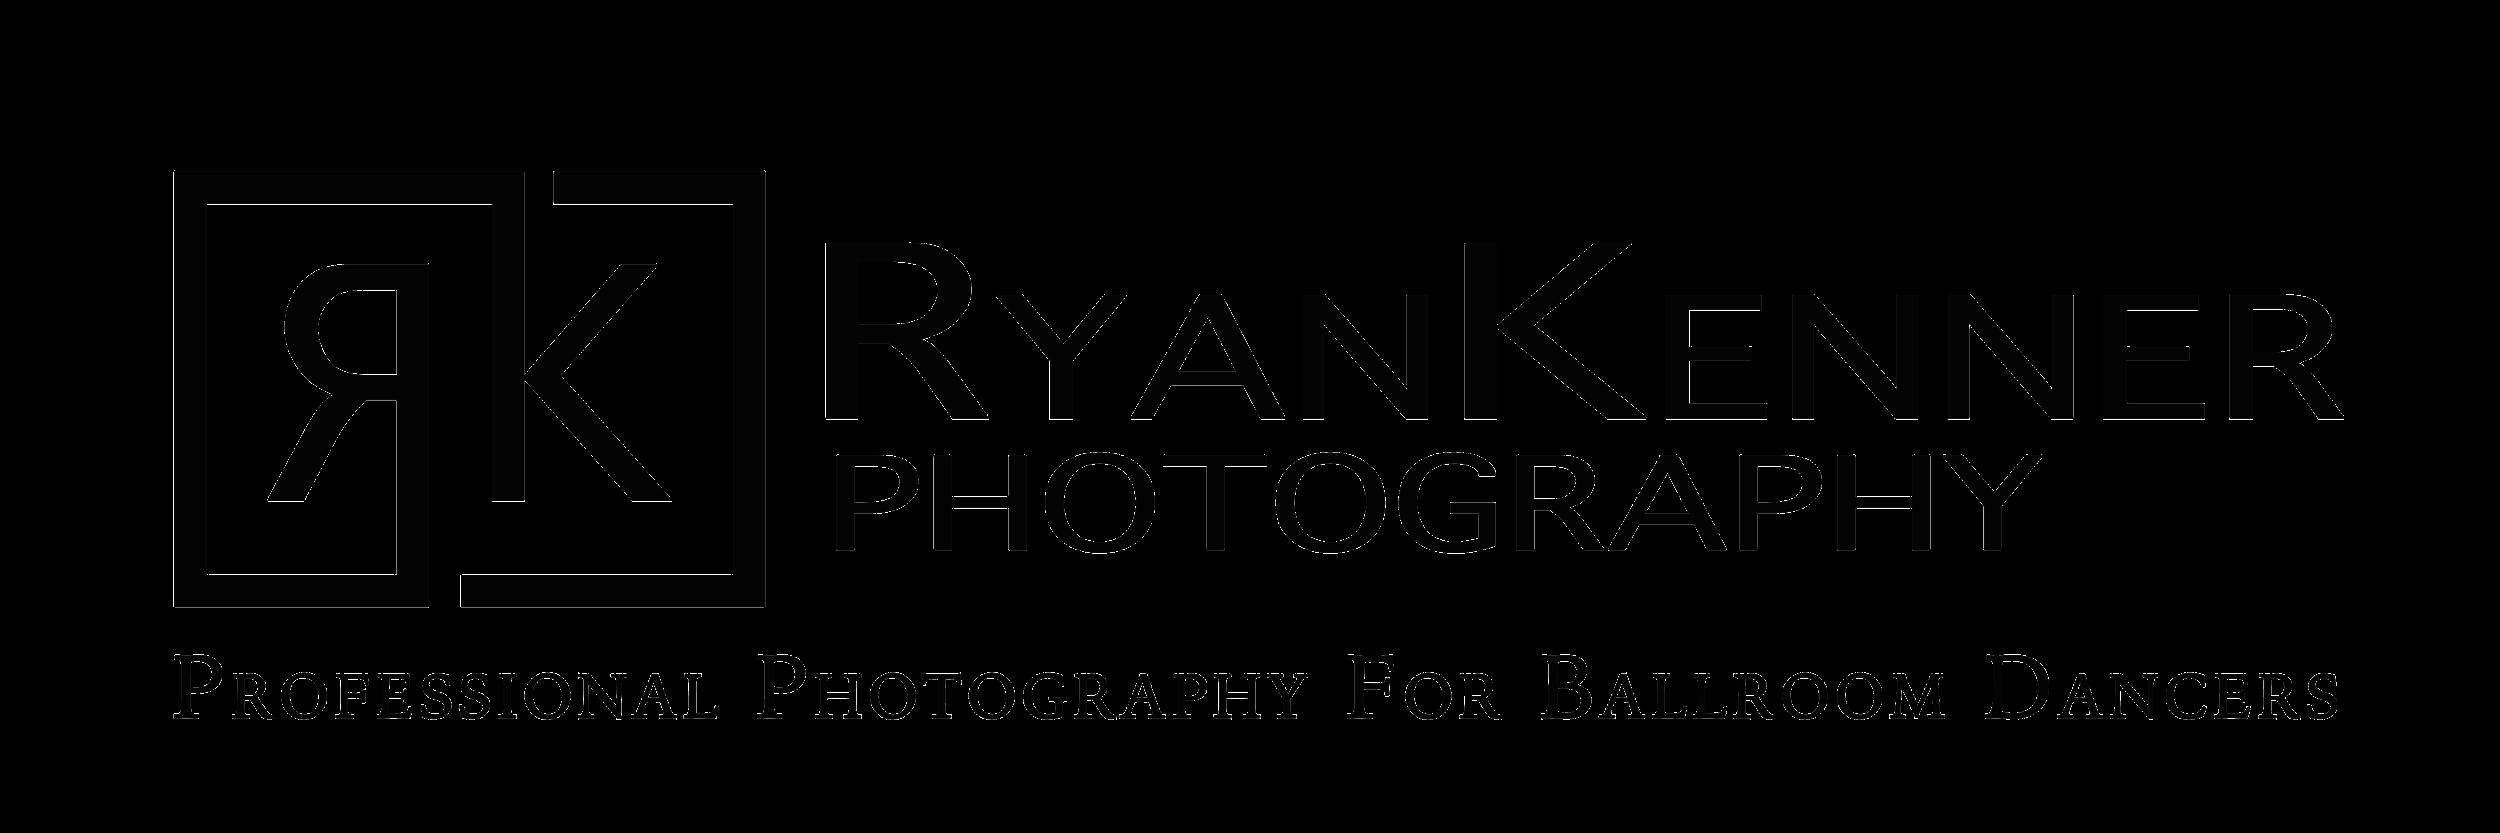 RKP Black Logo with Slogan.png